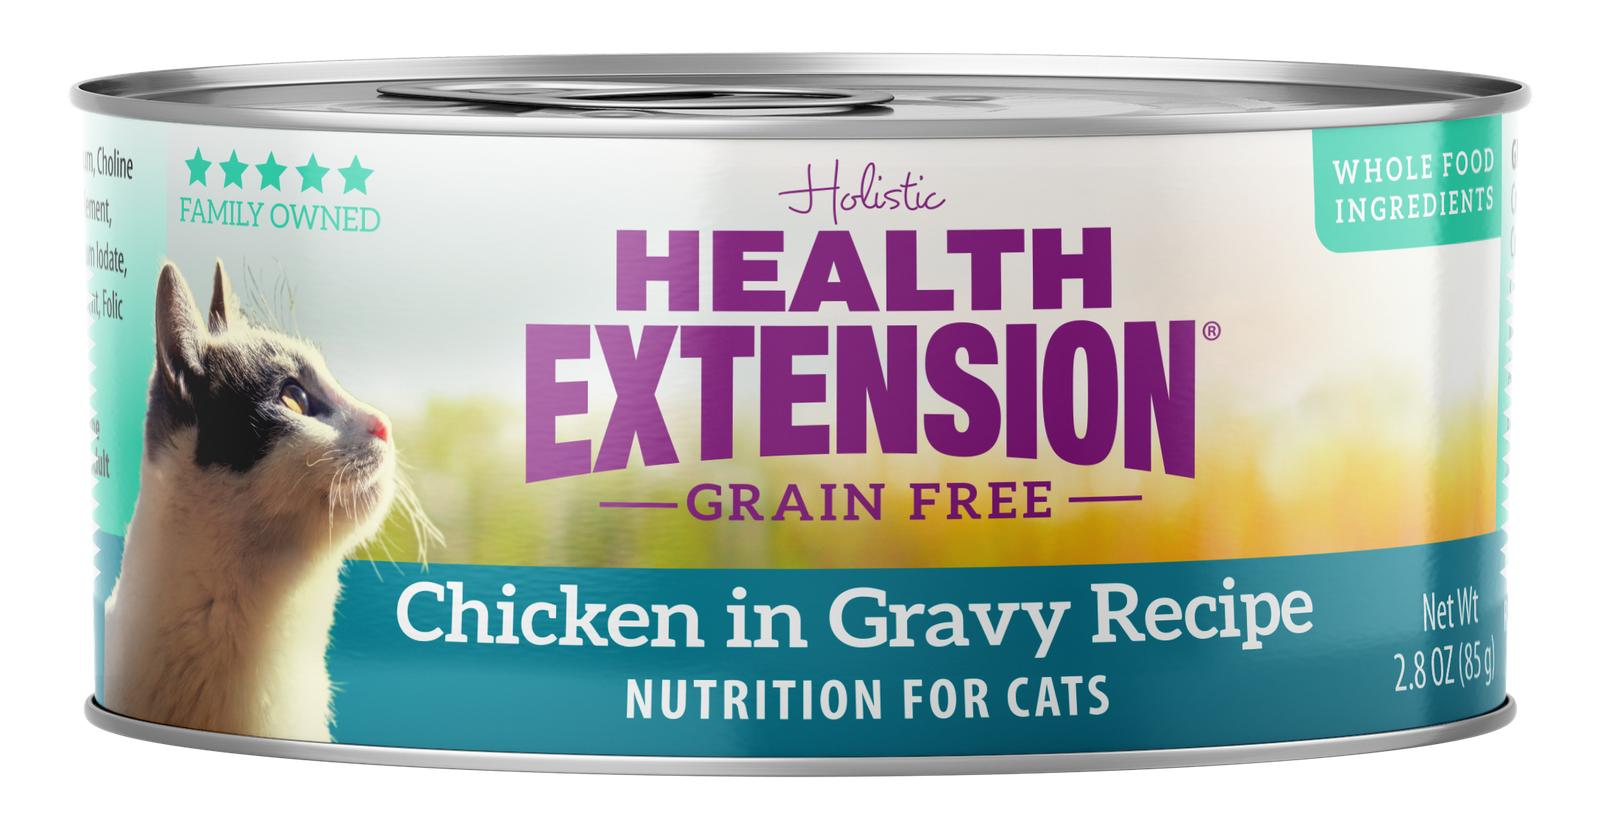 Health Extension Grain-Free Chicken in Gravy Recipe Wet Cat Food Image